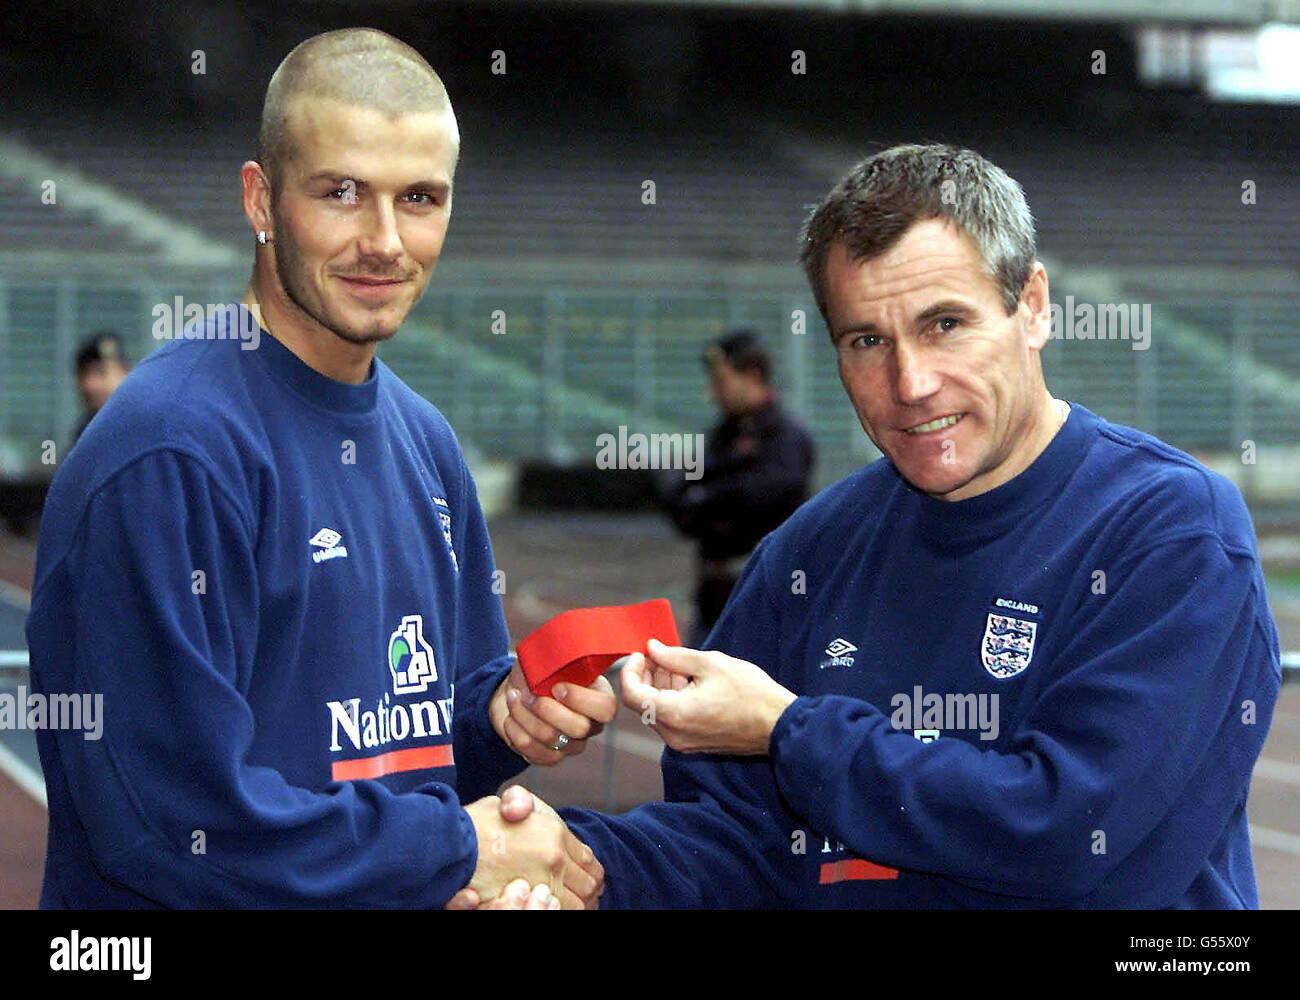 England Beckham & Taylor Turin - Stock Image